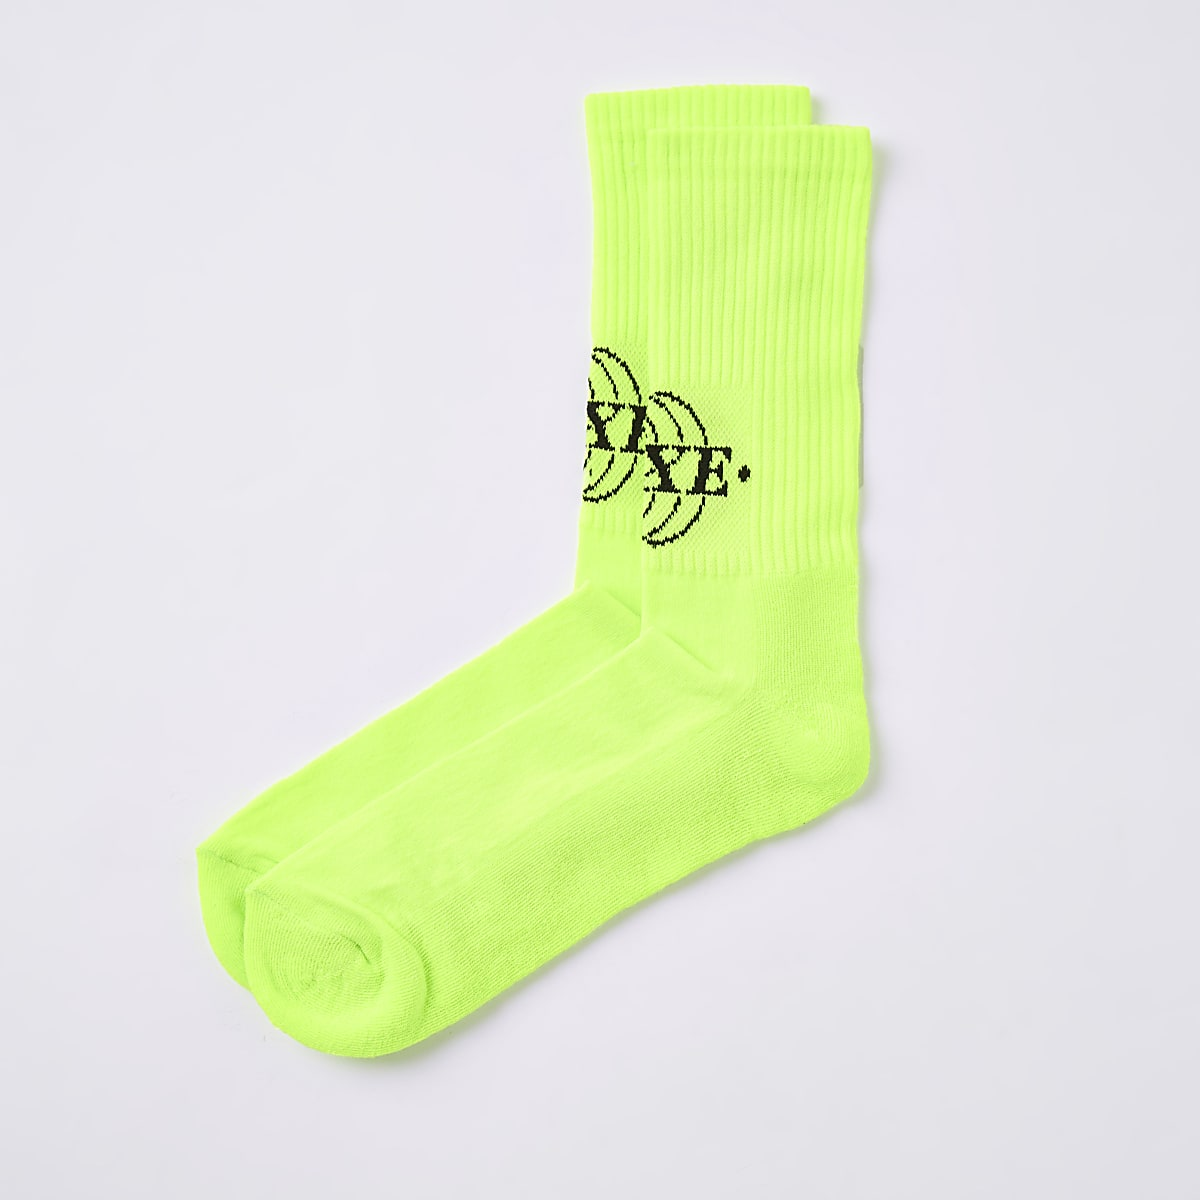 Neon yellow 'Luxe' socks